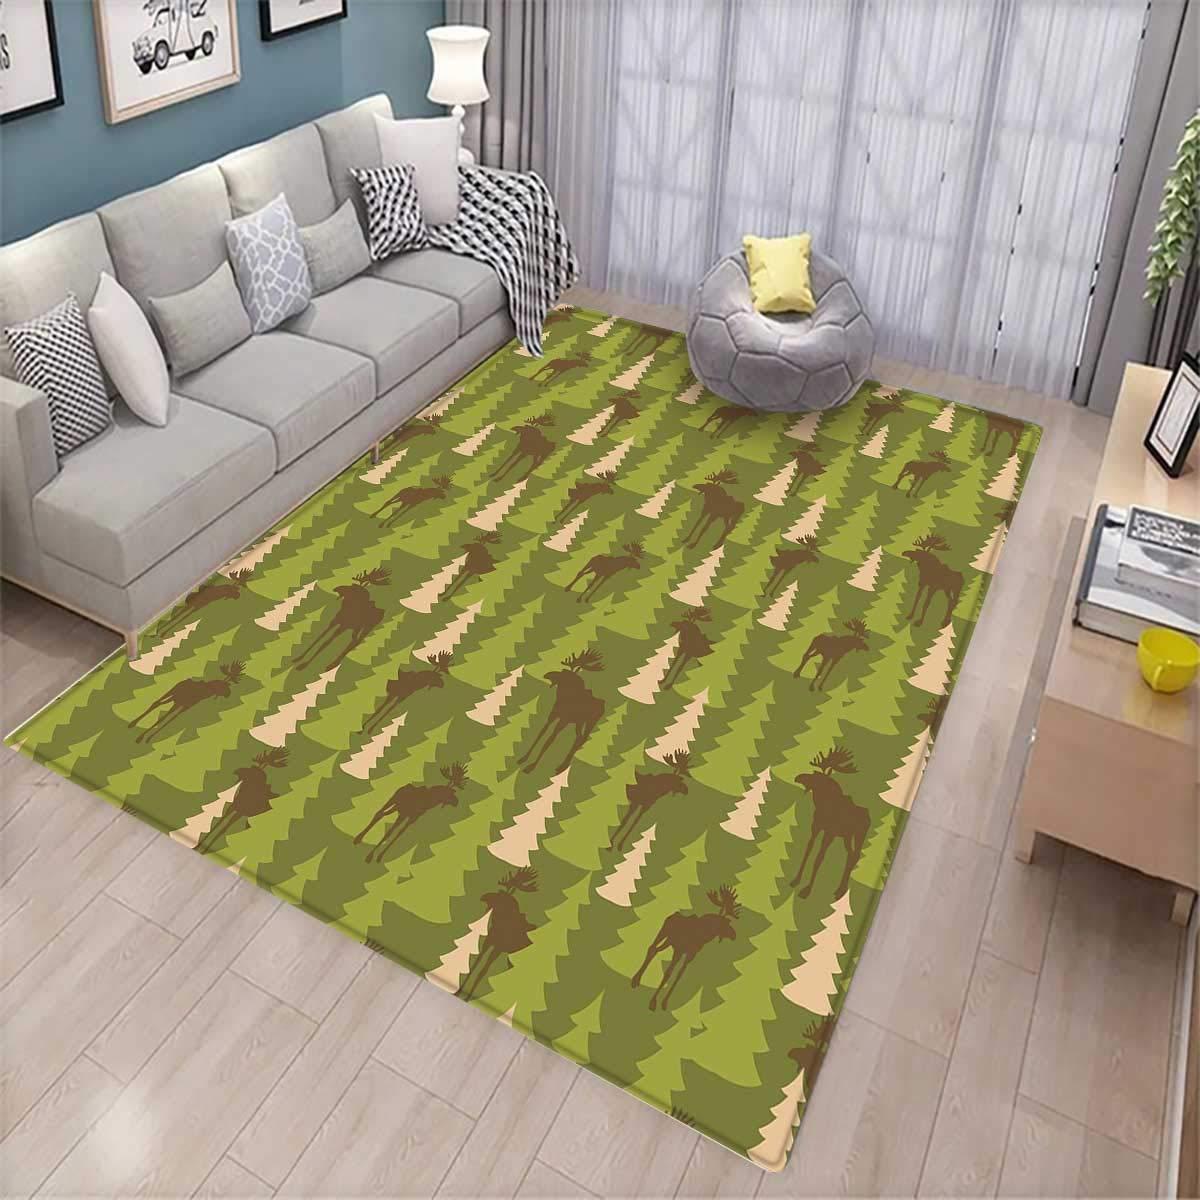 Stark Carpet Patterns Free Patterns